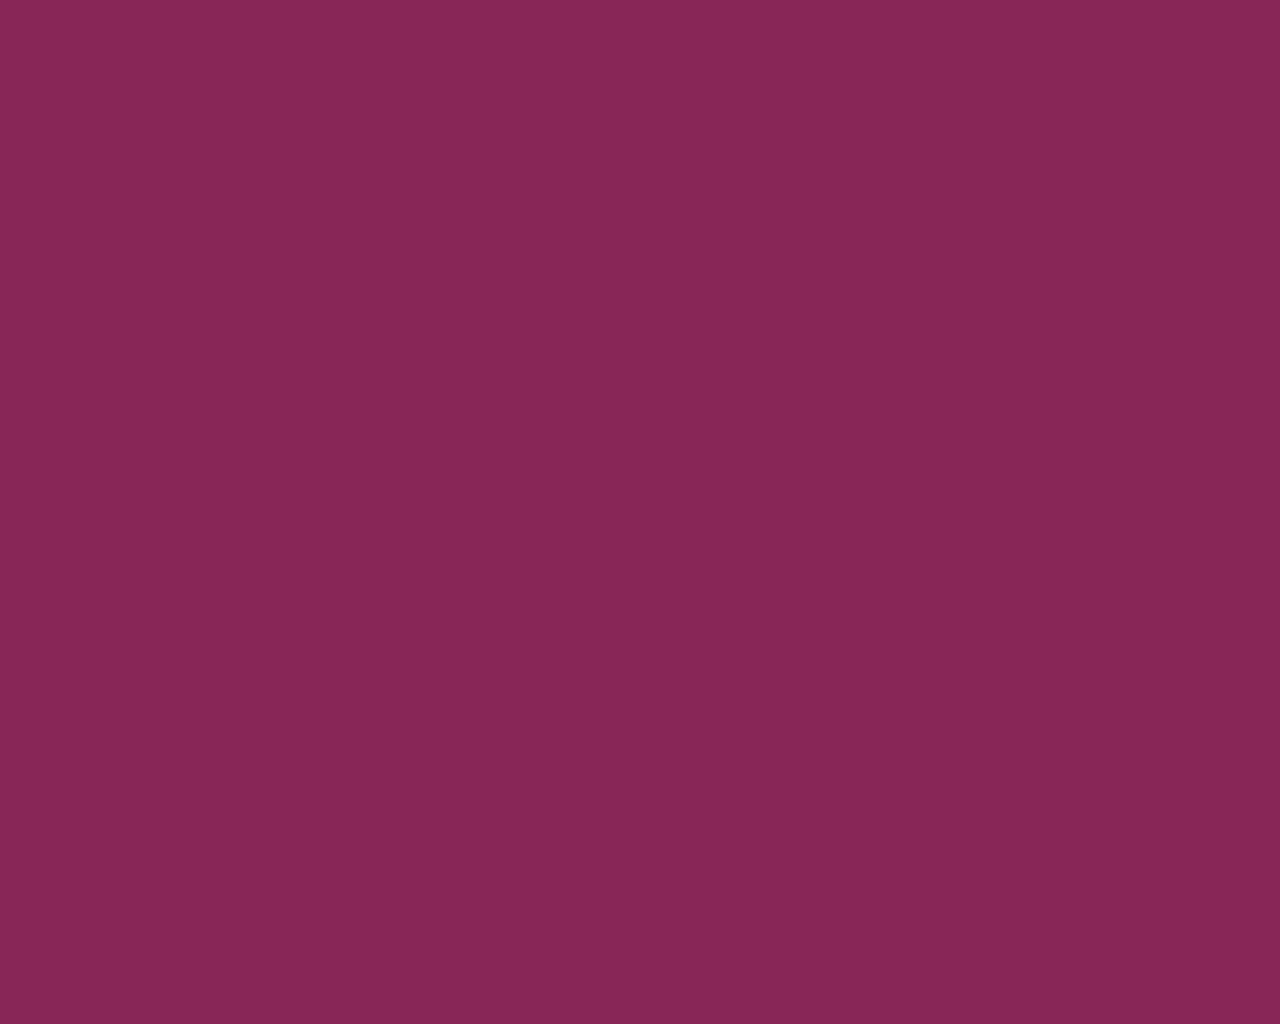 1280x1024 Dark Raspberry Solid Color Background